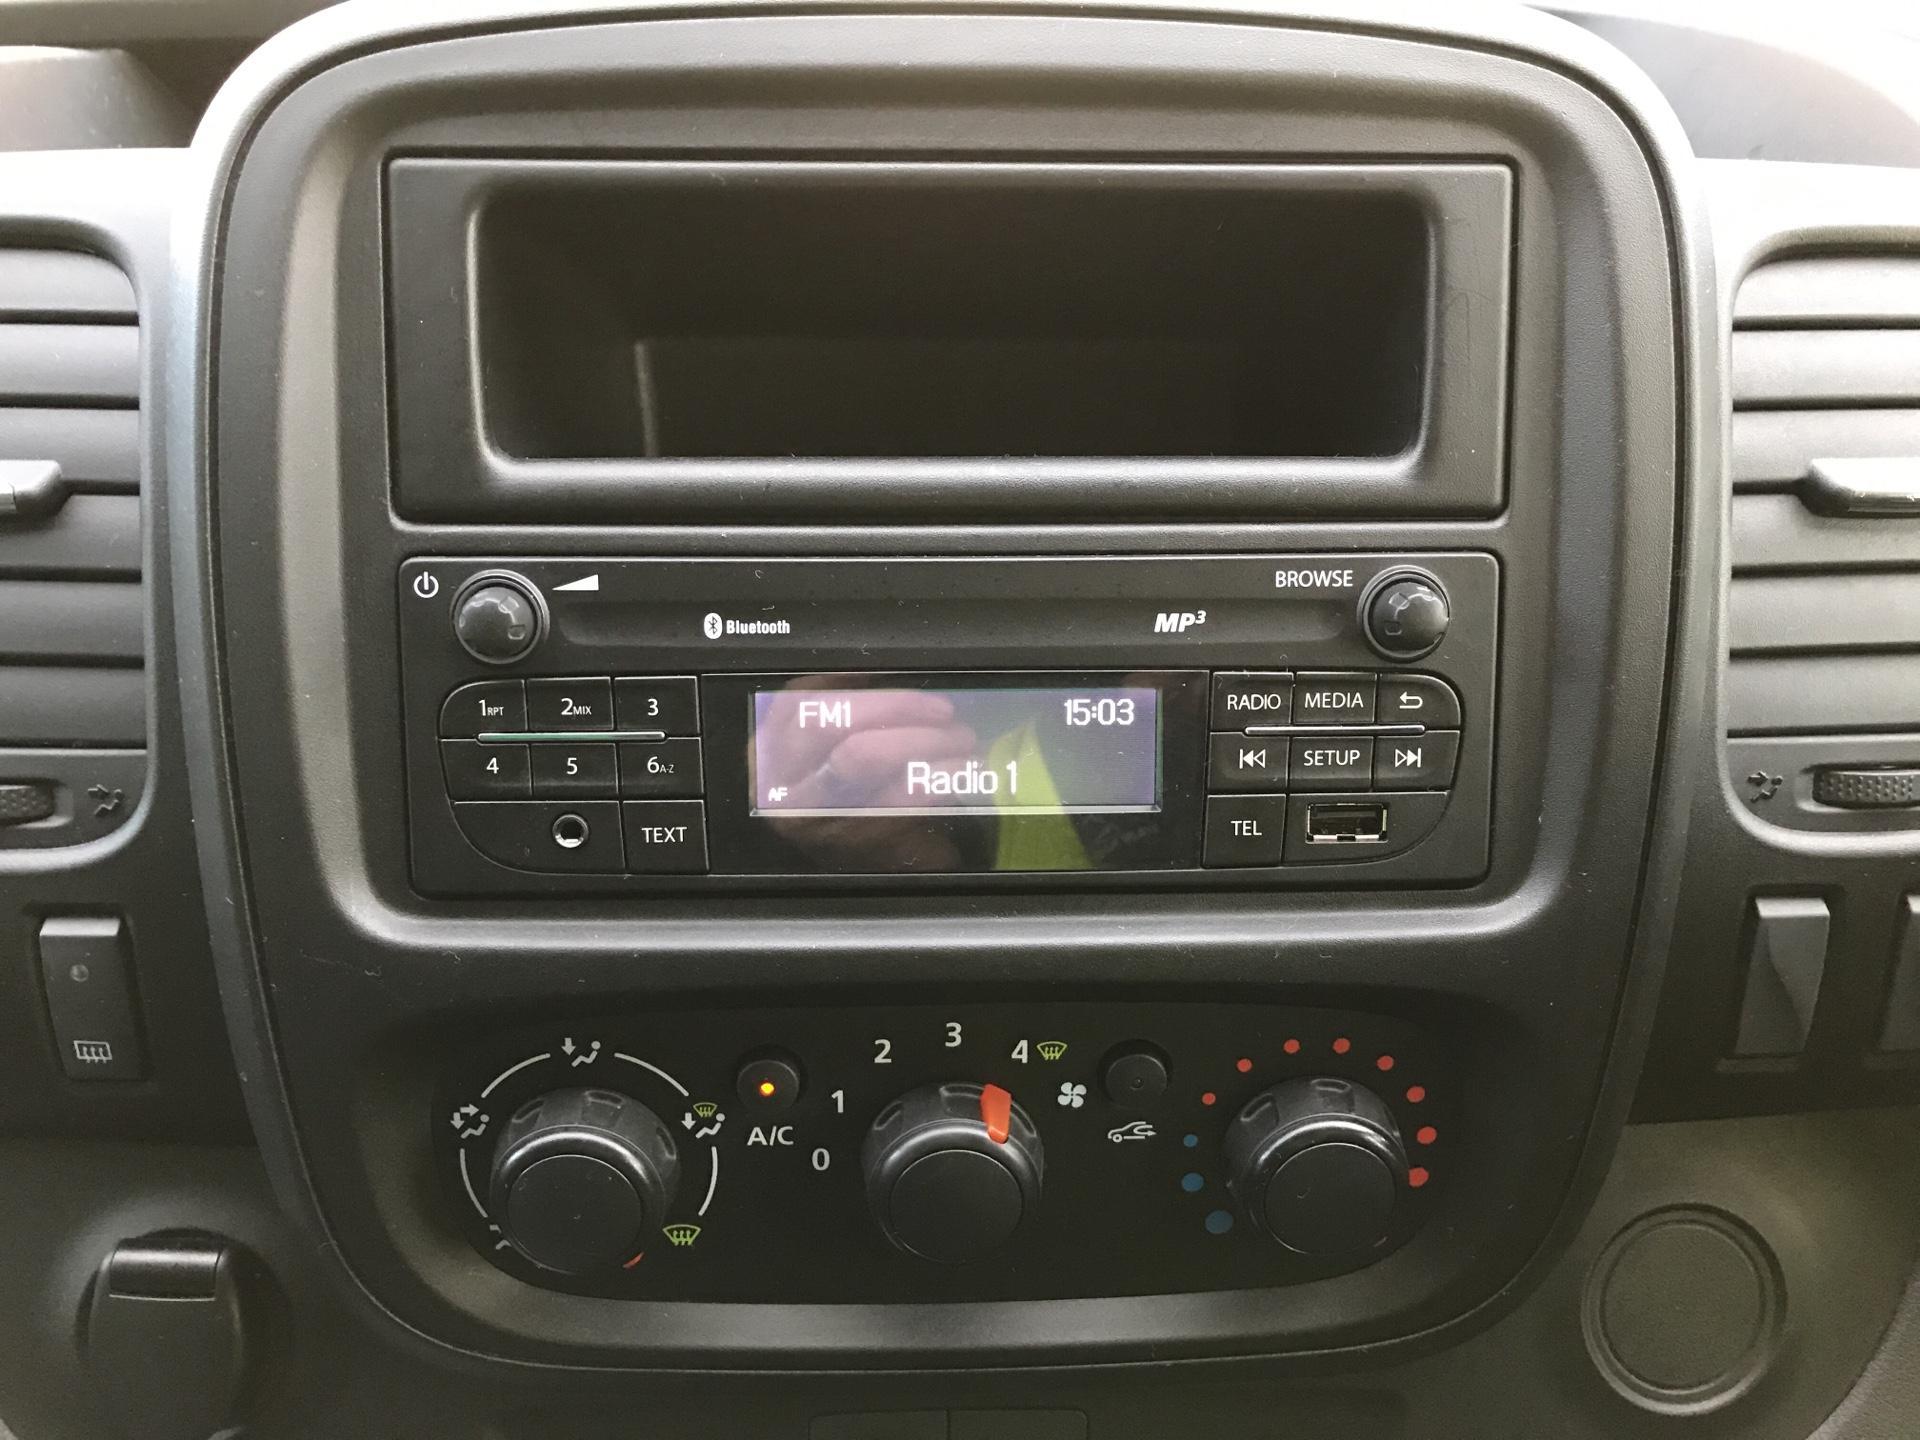 2017 Vauxhall Vivaro L2 H1 2900 1.6 CDTI 95PS EURO 6 (VALUE RANGE VEHICLE - CONDITION REFLECTED IN PRICE) (BK17OJZ) Image 10